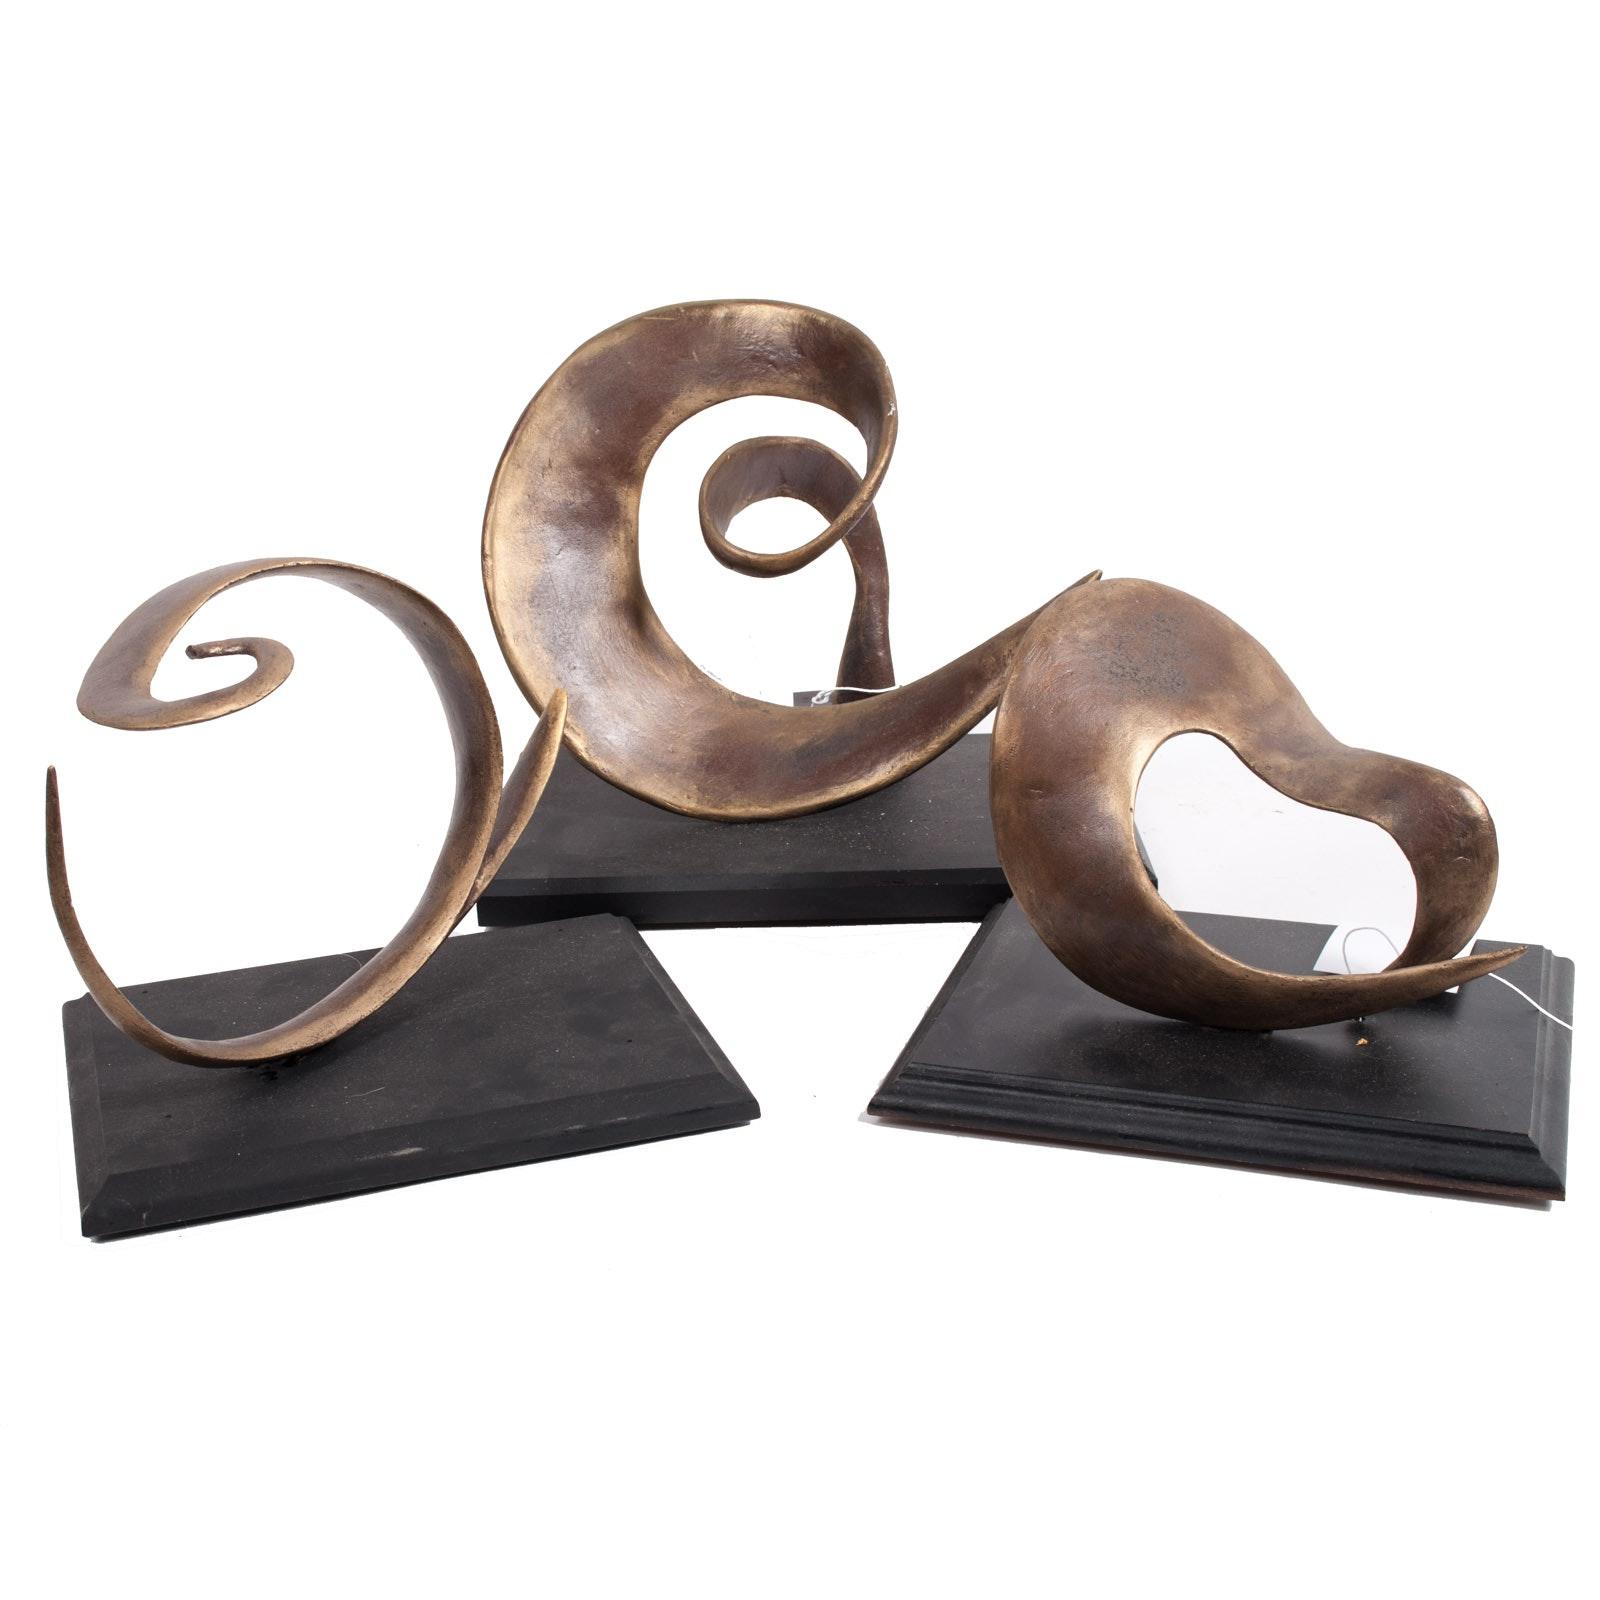 Virginia K. Hess Cold Bronze Maquette Abstract Sculptures